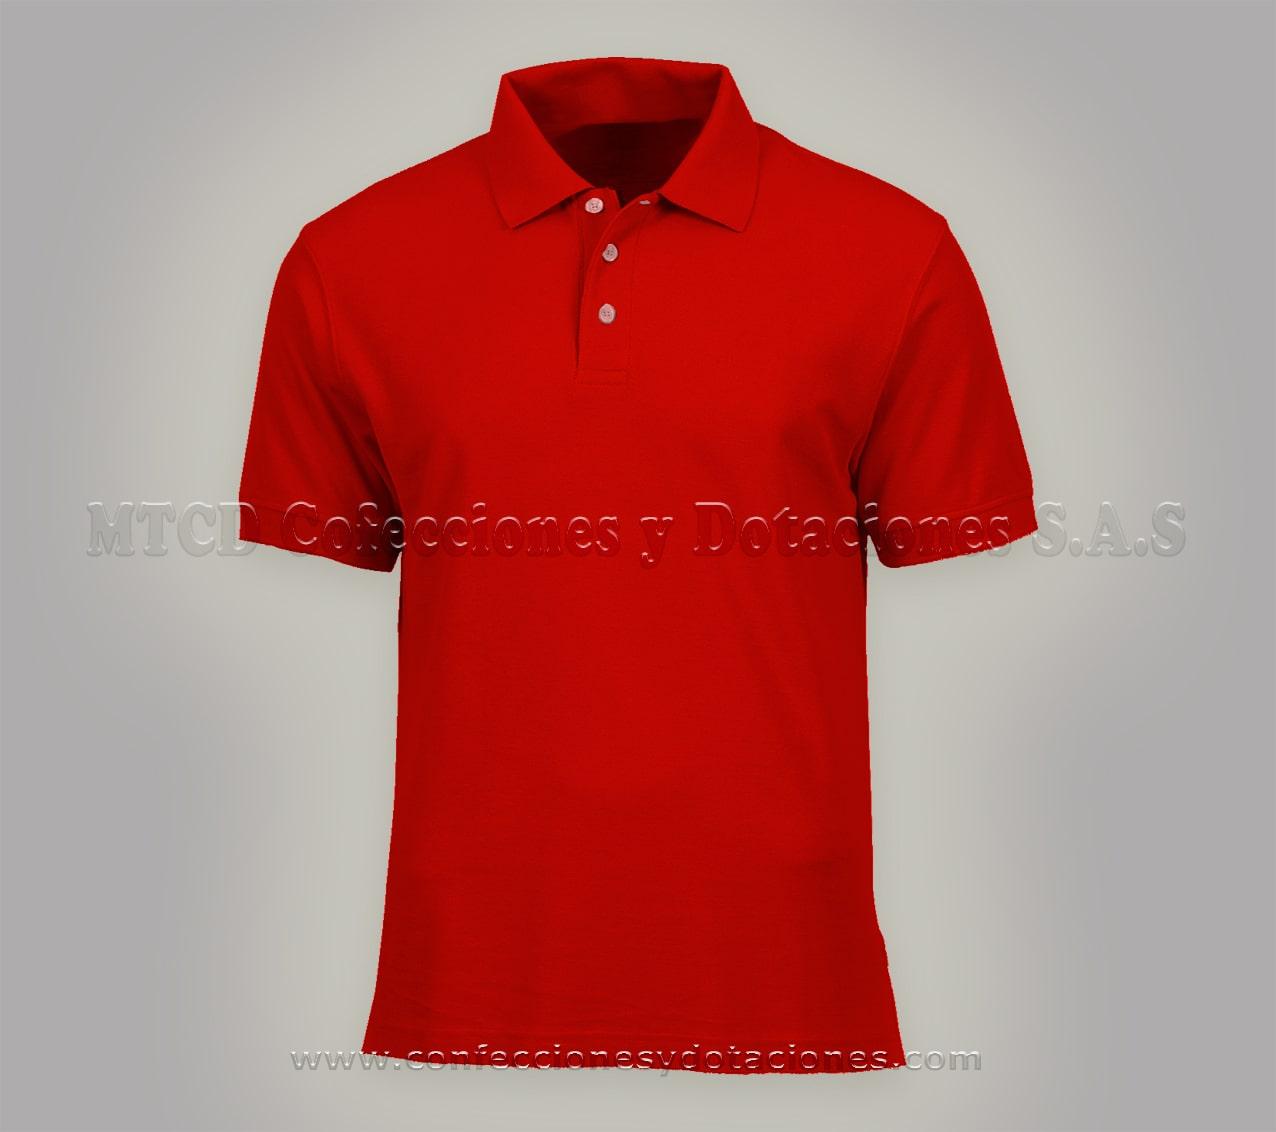 Camisa Polo roja personalizada